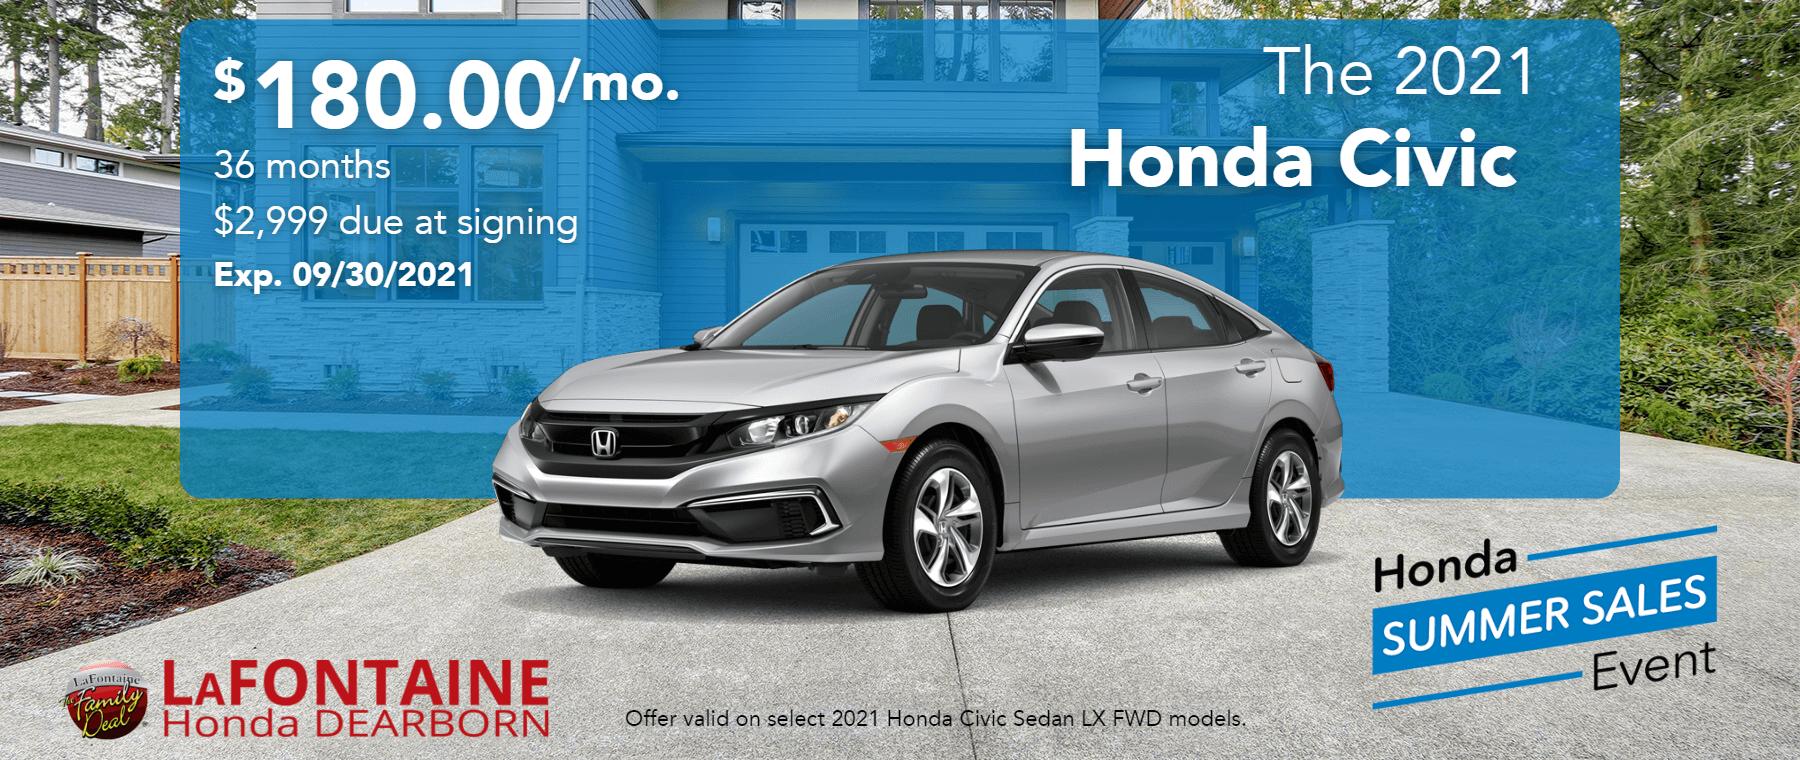 2021_Honda_Civic_Sedan LX_Wed Sep 08 2021 12_34_25 GMT-0400 (Eastern Daylight Time)